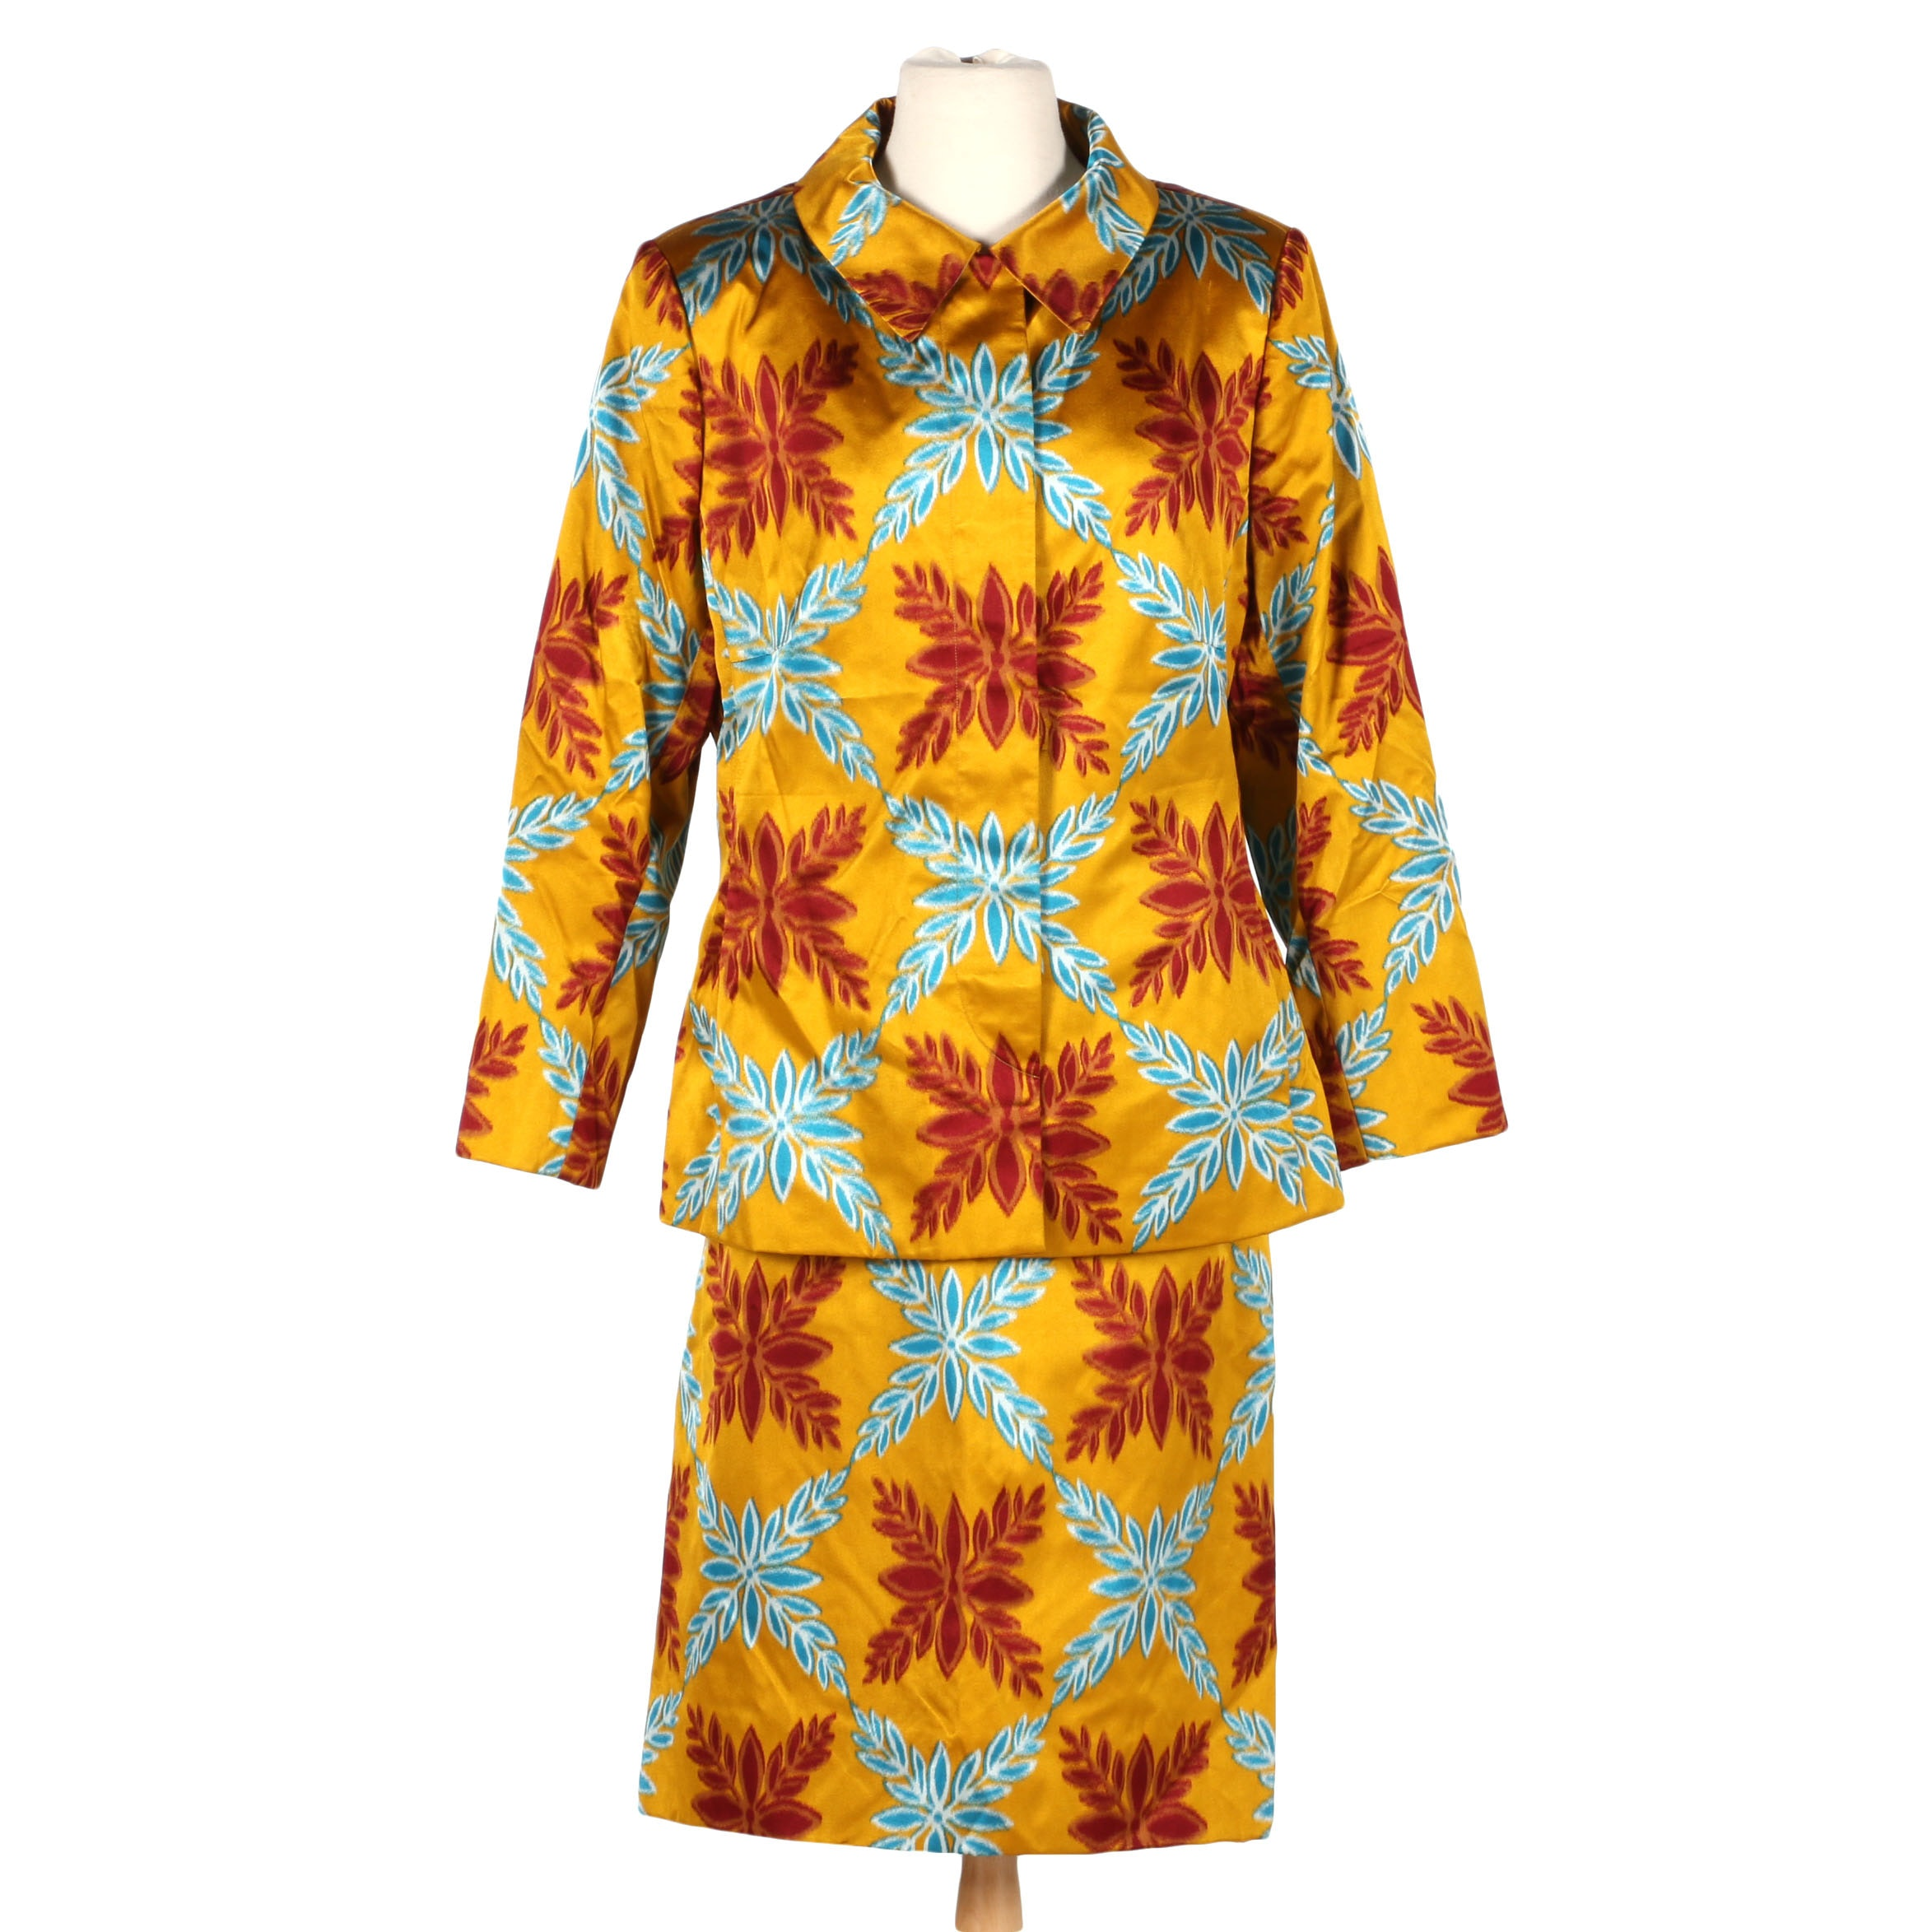 Colorful Bill Blass Skirt Suit